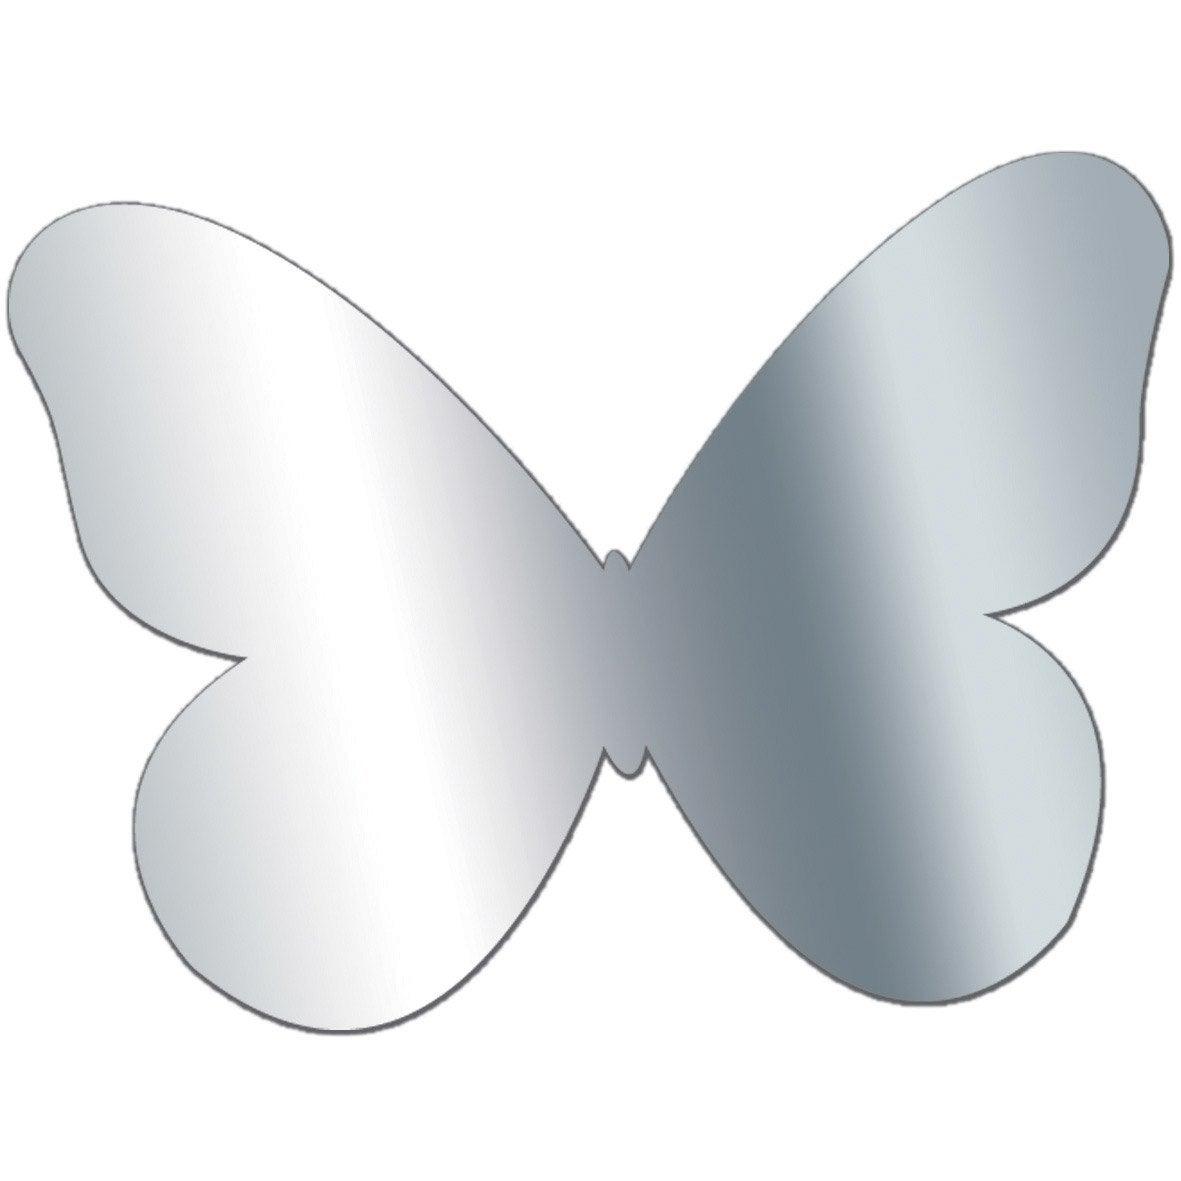 miroir en plexiglass papillon 10 cm x 10 cm leroy merlin. Black Bedroom Furniture Sets. Home Design Ideas